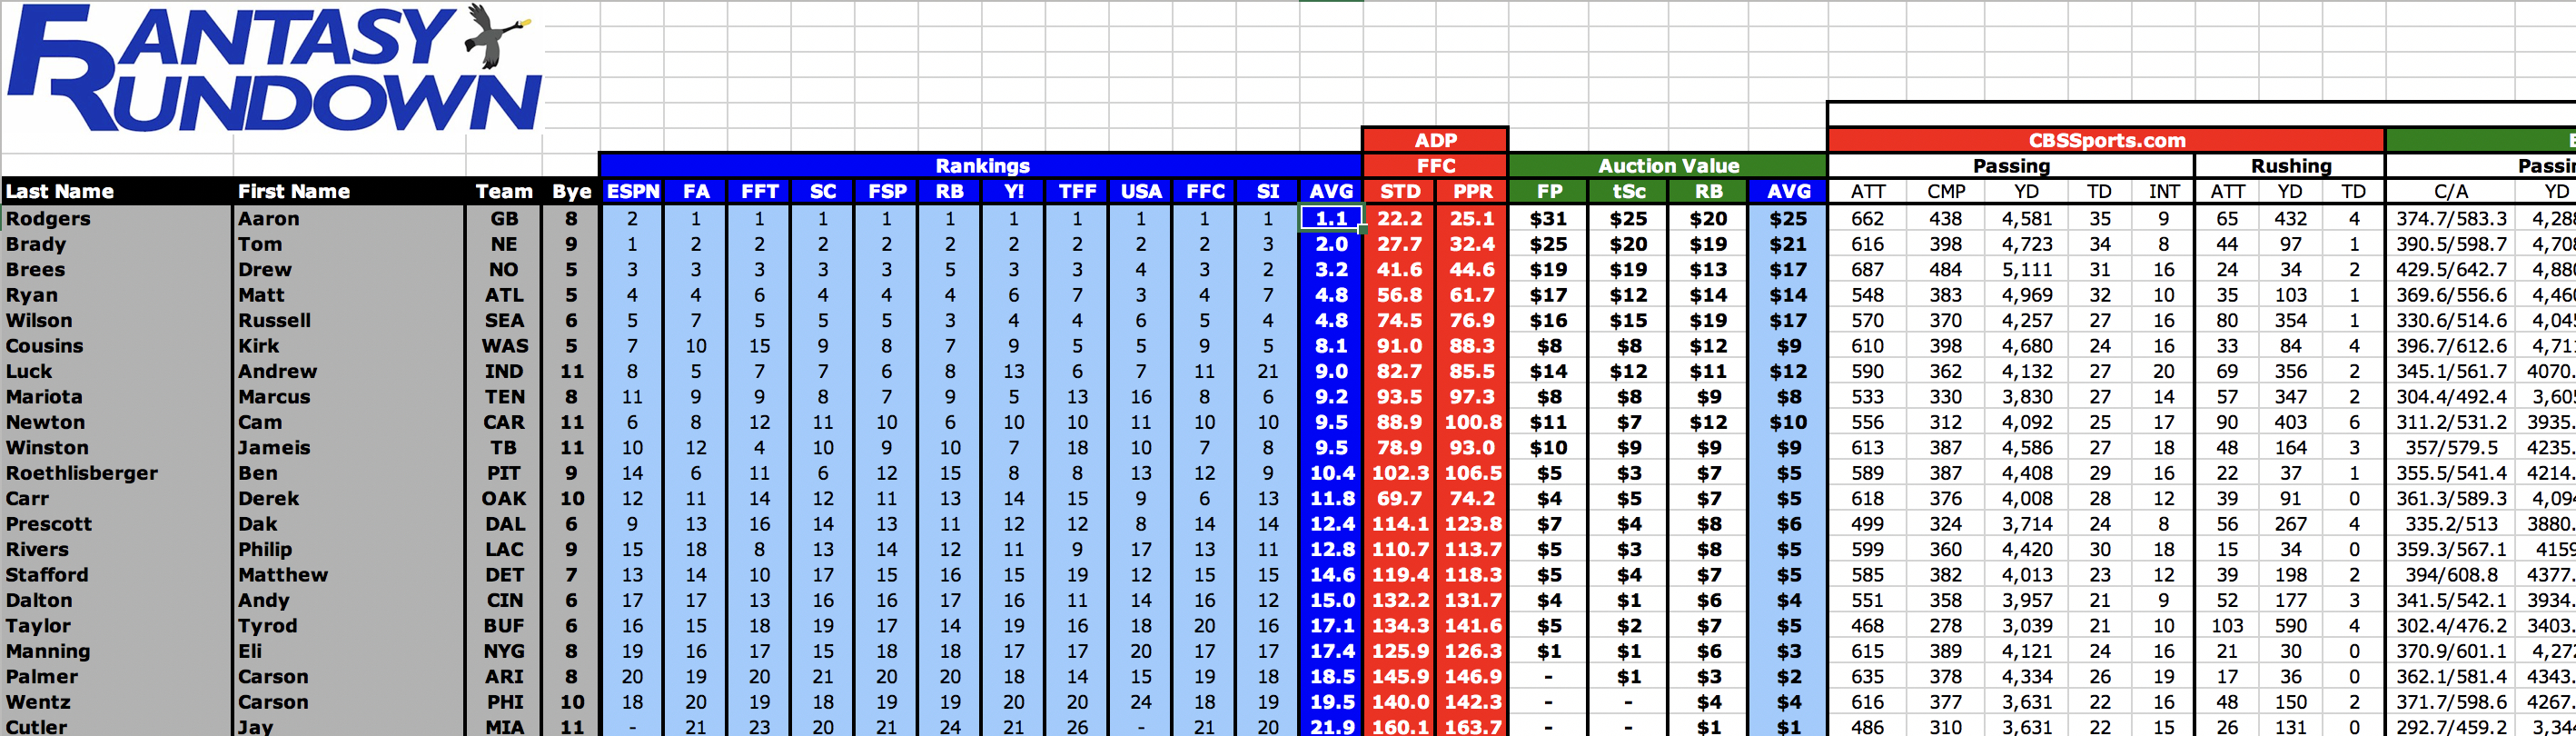 Fantasy Football Spreadsheet With Regard To Z2018 Ultimate Football Spreadsheet  Fantasyrundown